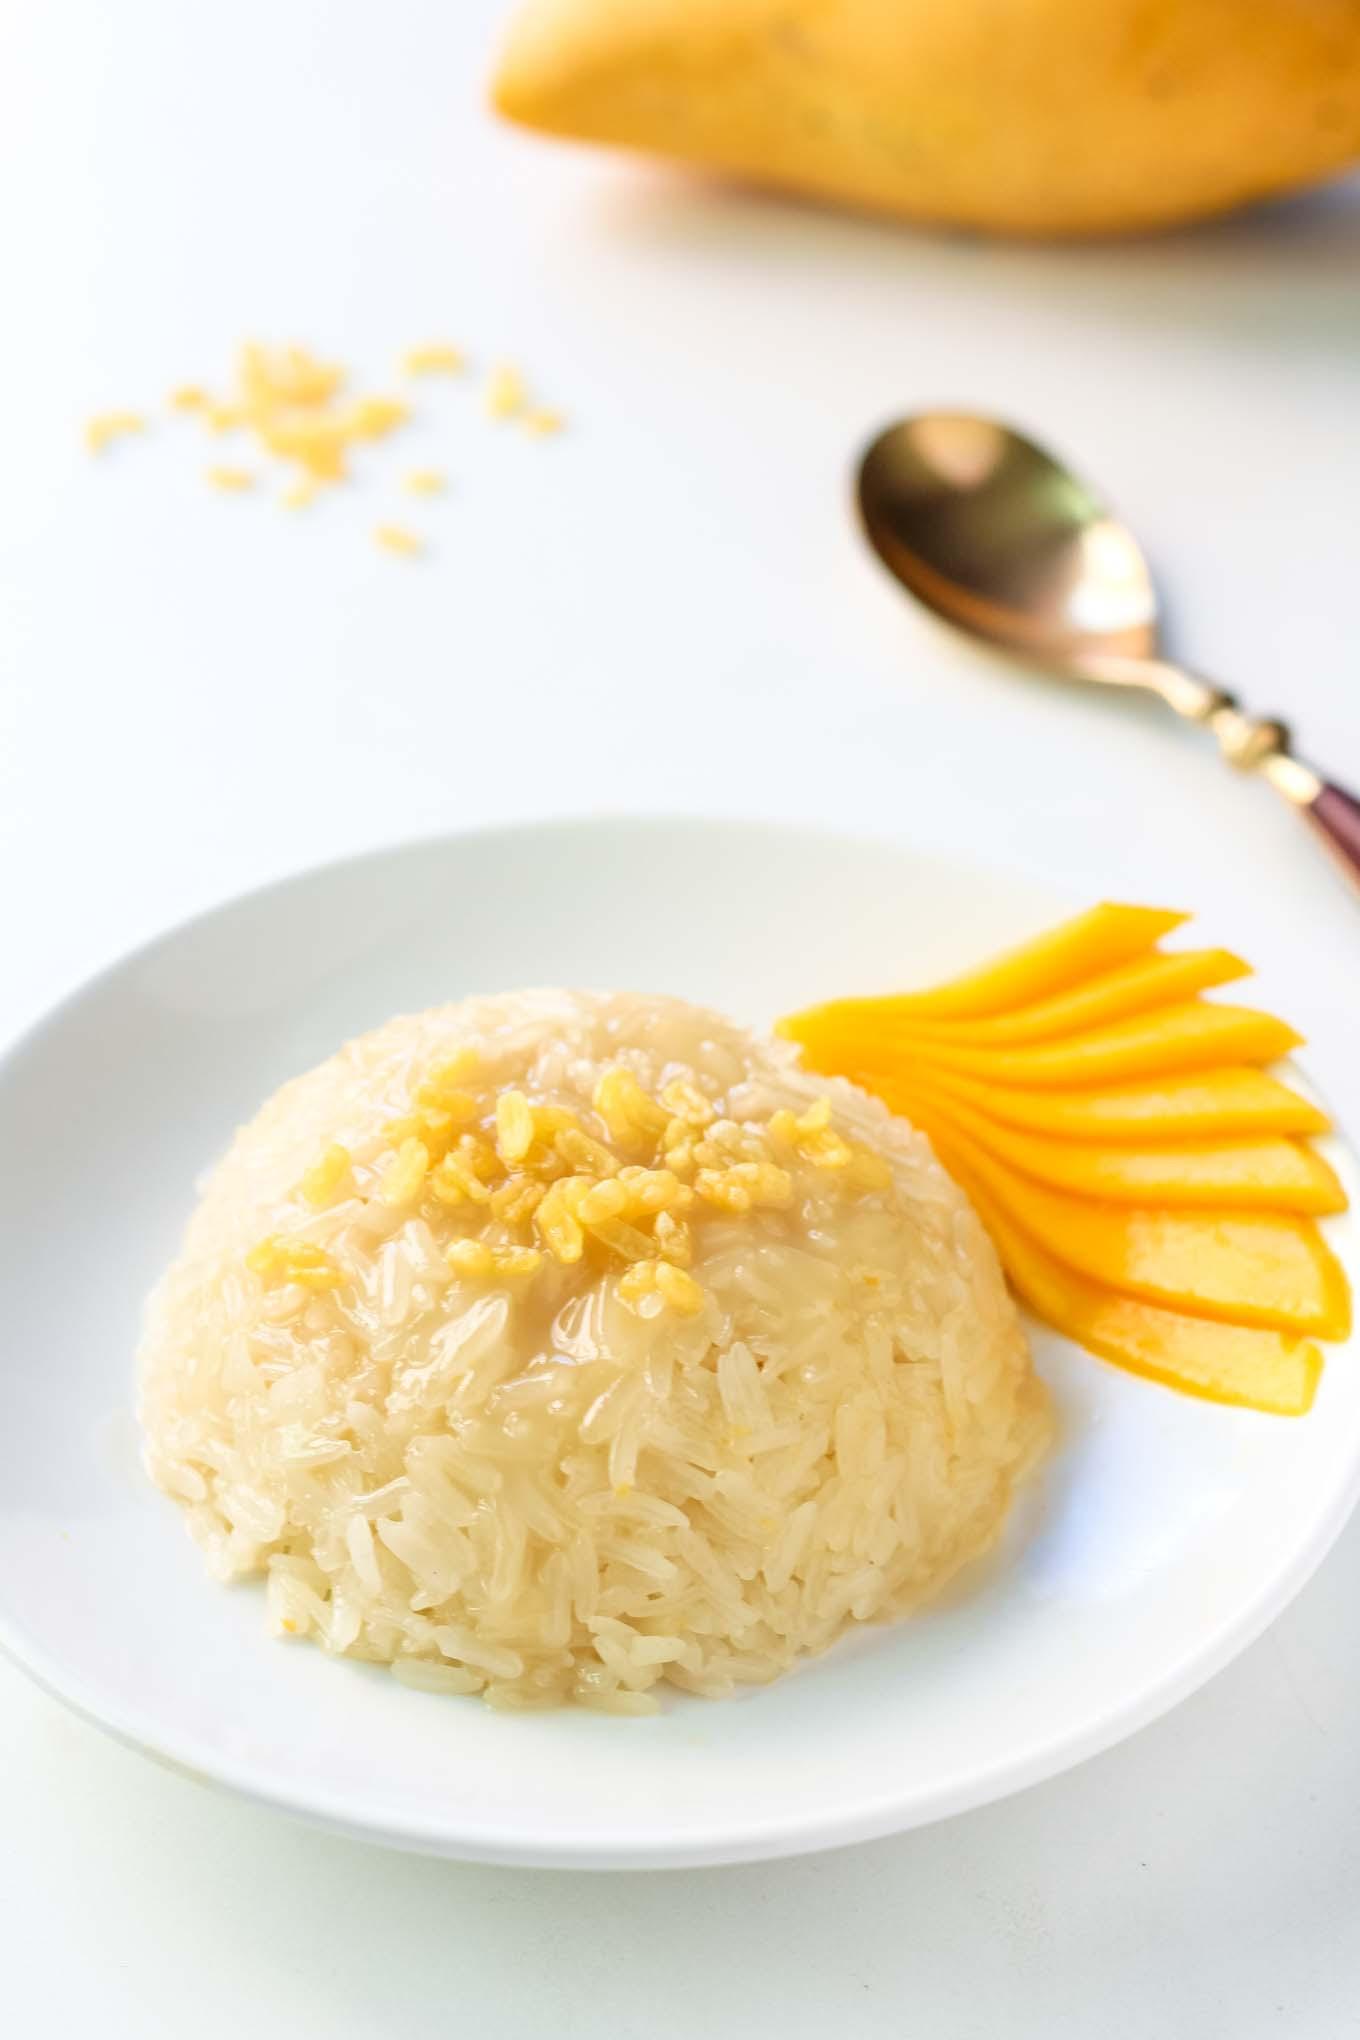 Thai Mango Sticky Rice Dessert Recipe - LeelaLicious